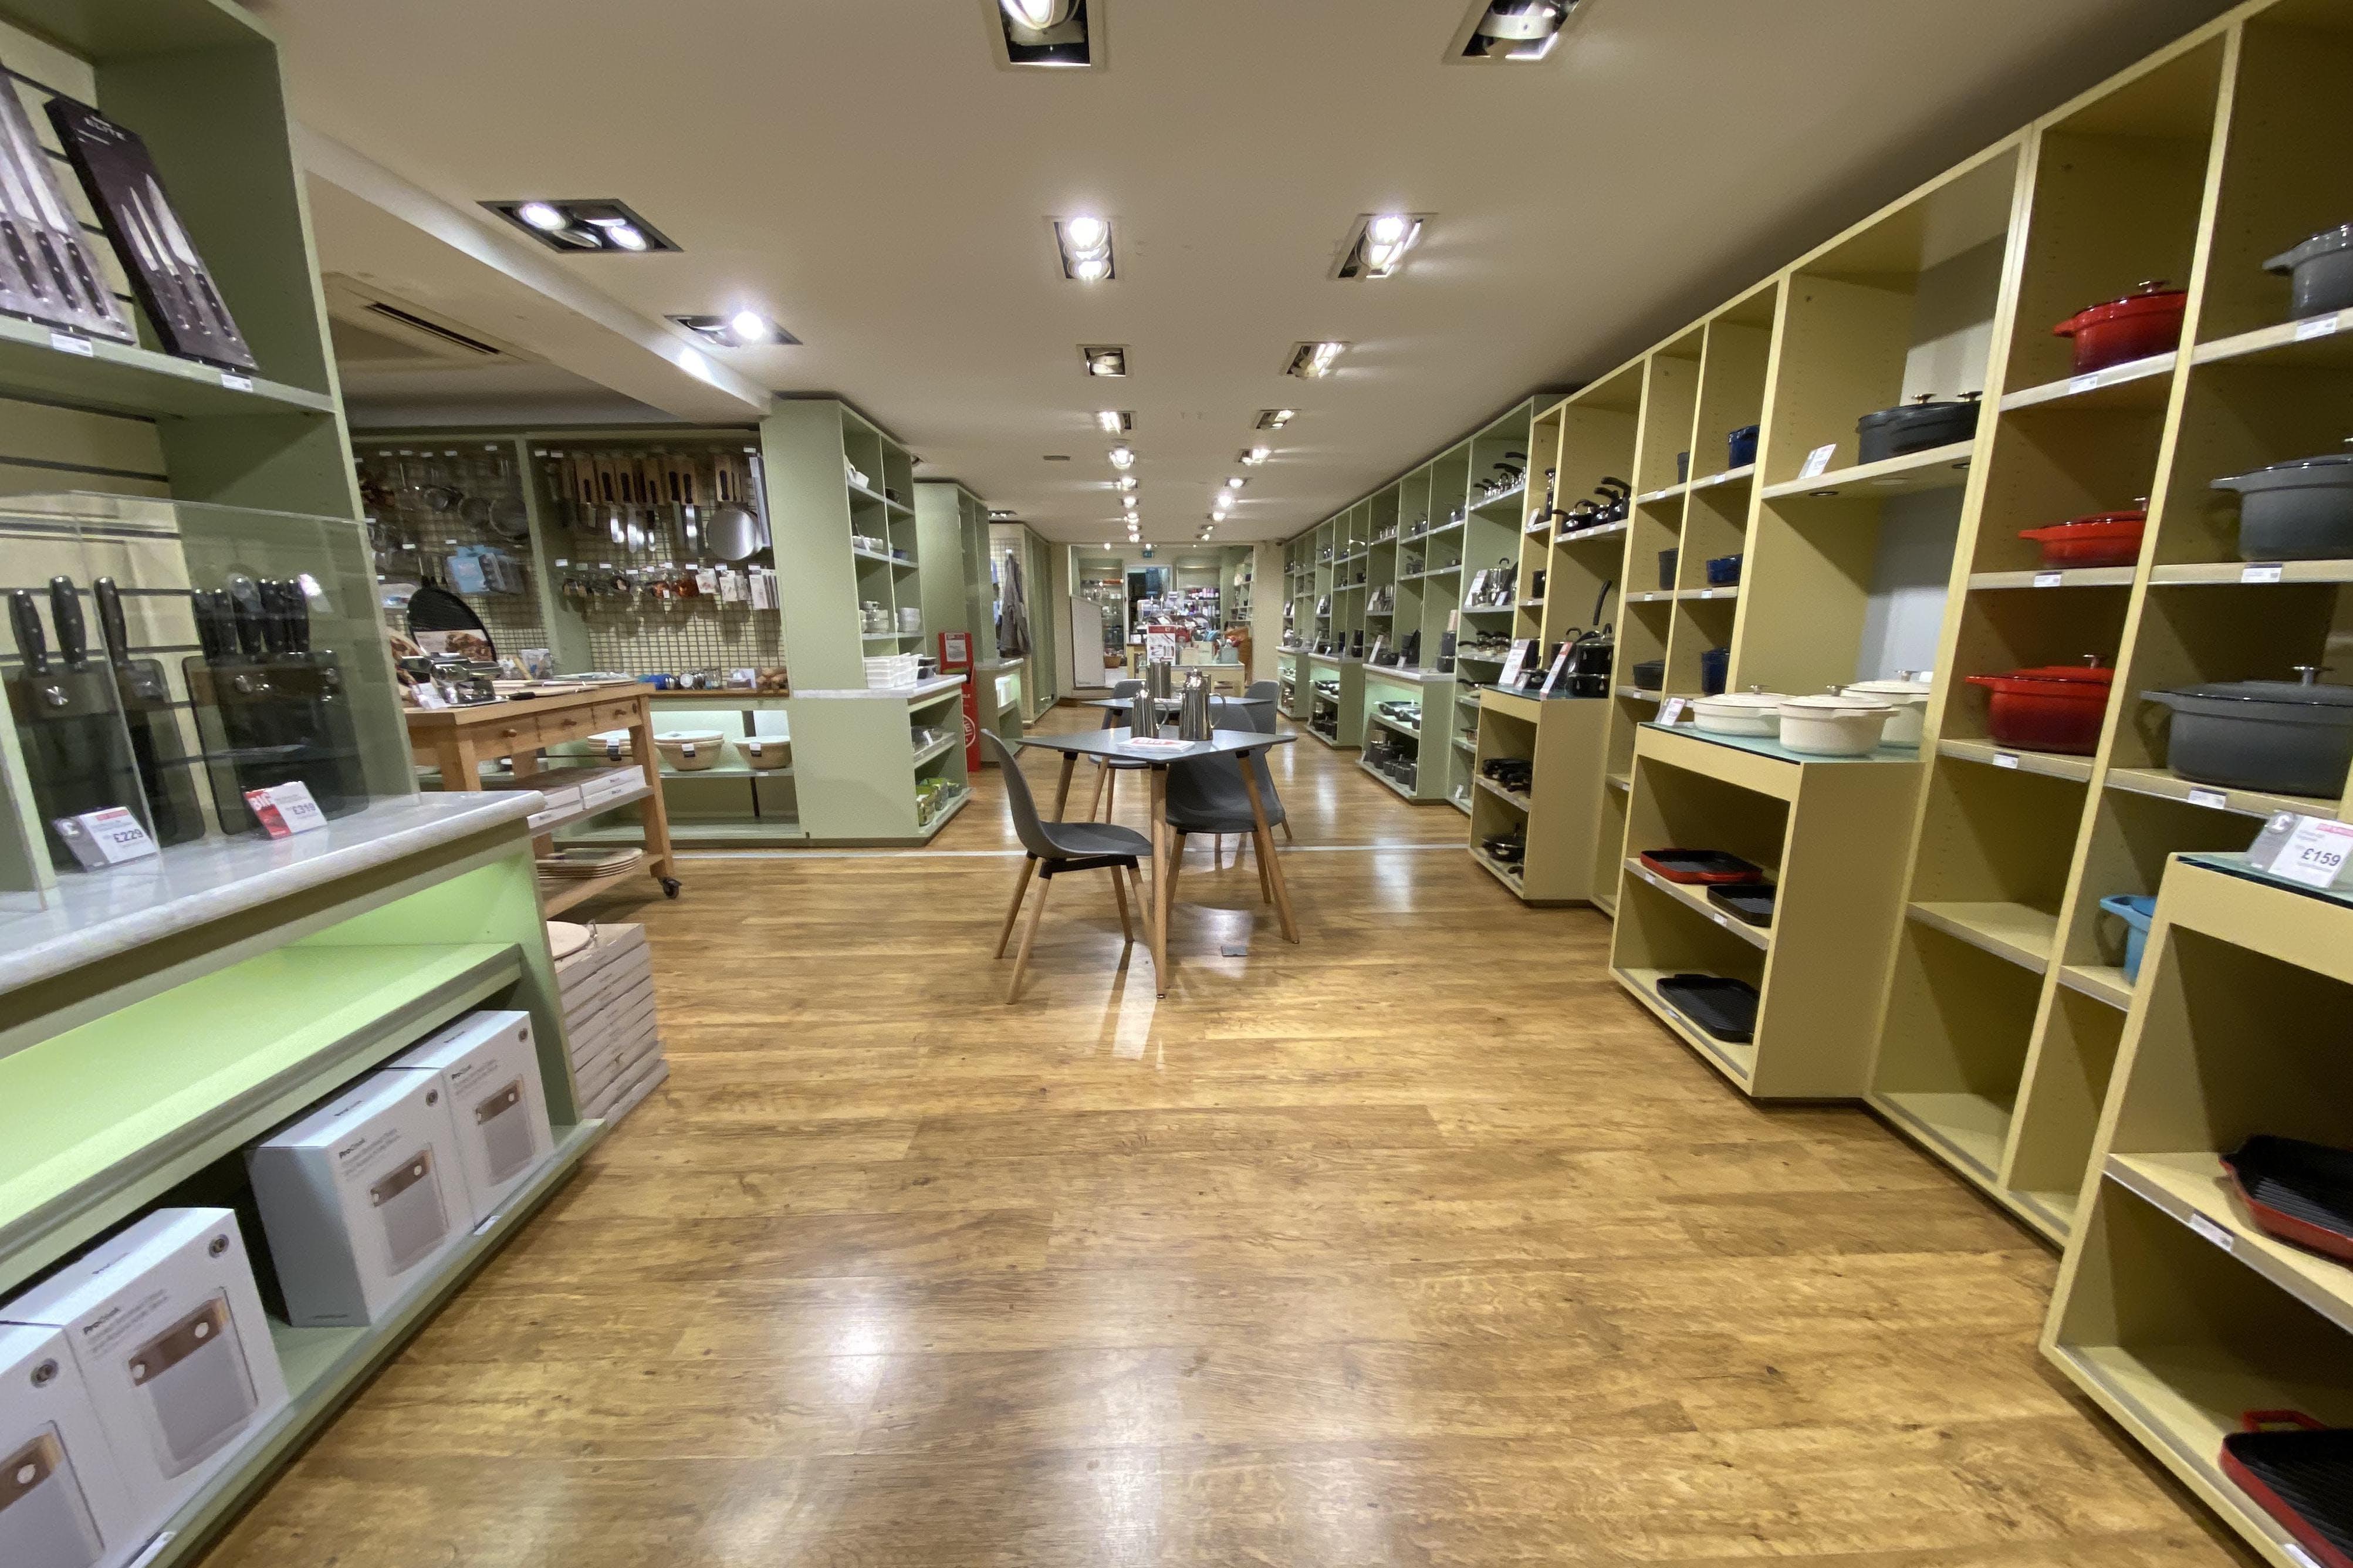 109 High Street, Thame, Retail To Let - IMG_5663.JPG